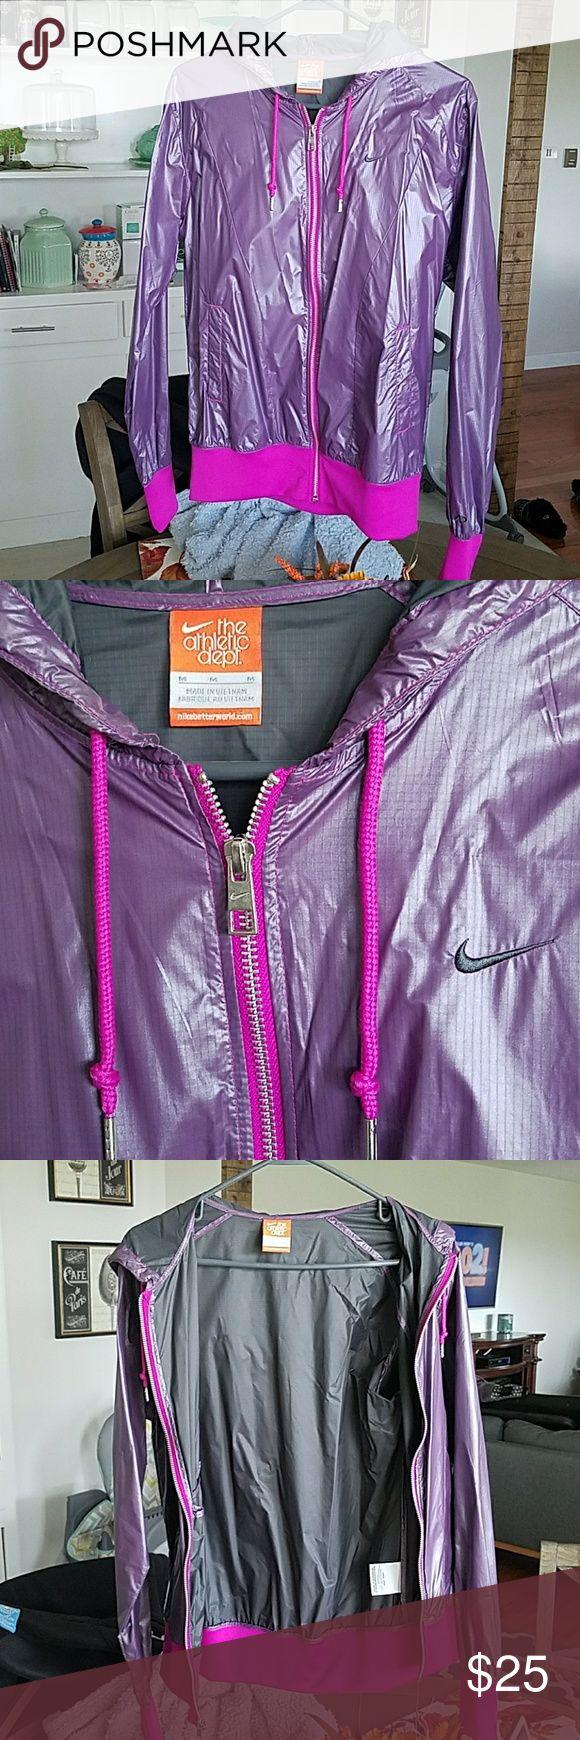 Nike rainjacket NWOT Purple Nike Rain Jacket, never been worn, pink elastic waistband and wristbands, size M, super lightweight nylon. Nike Jackets & Coats